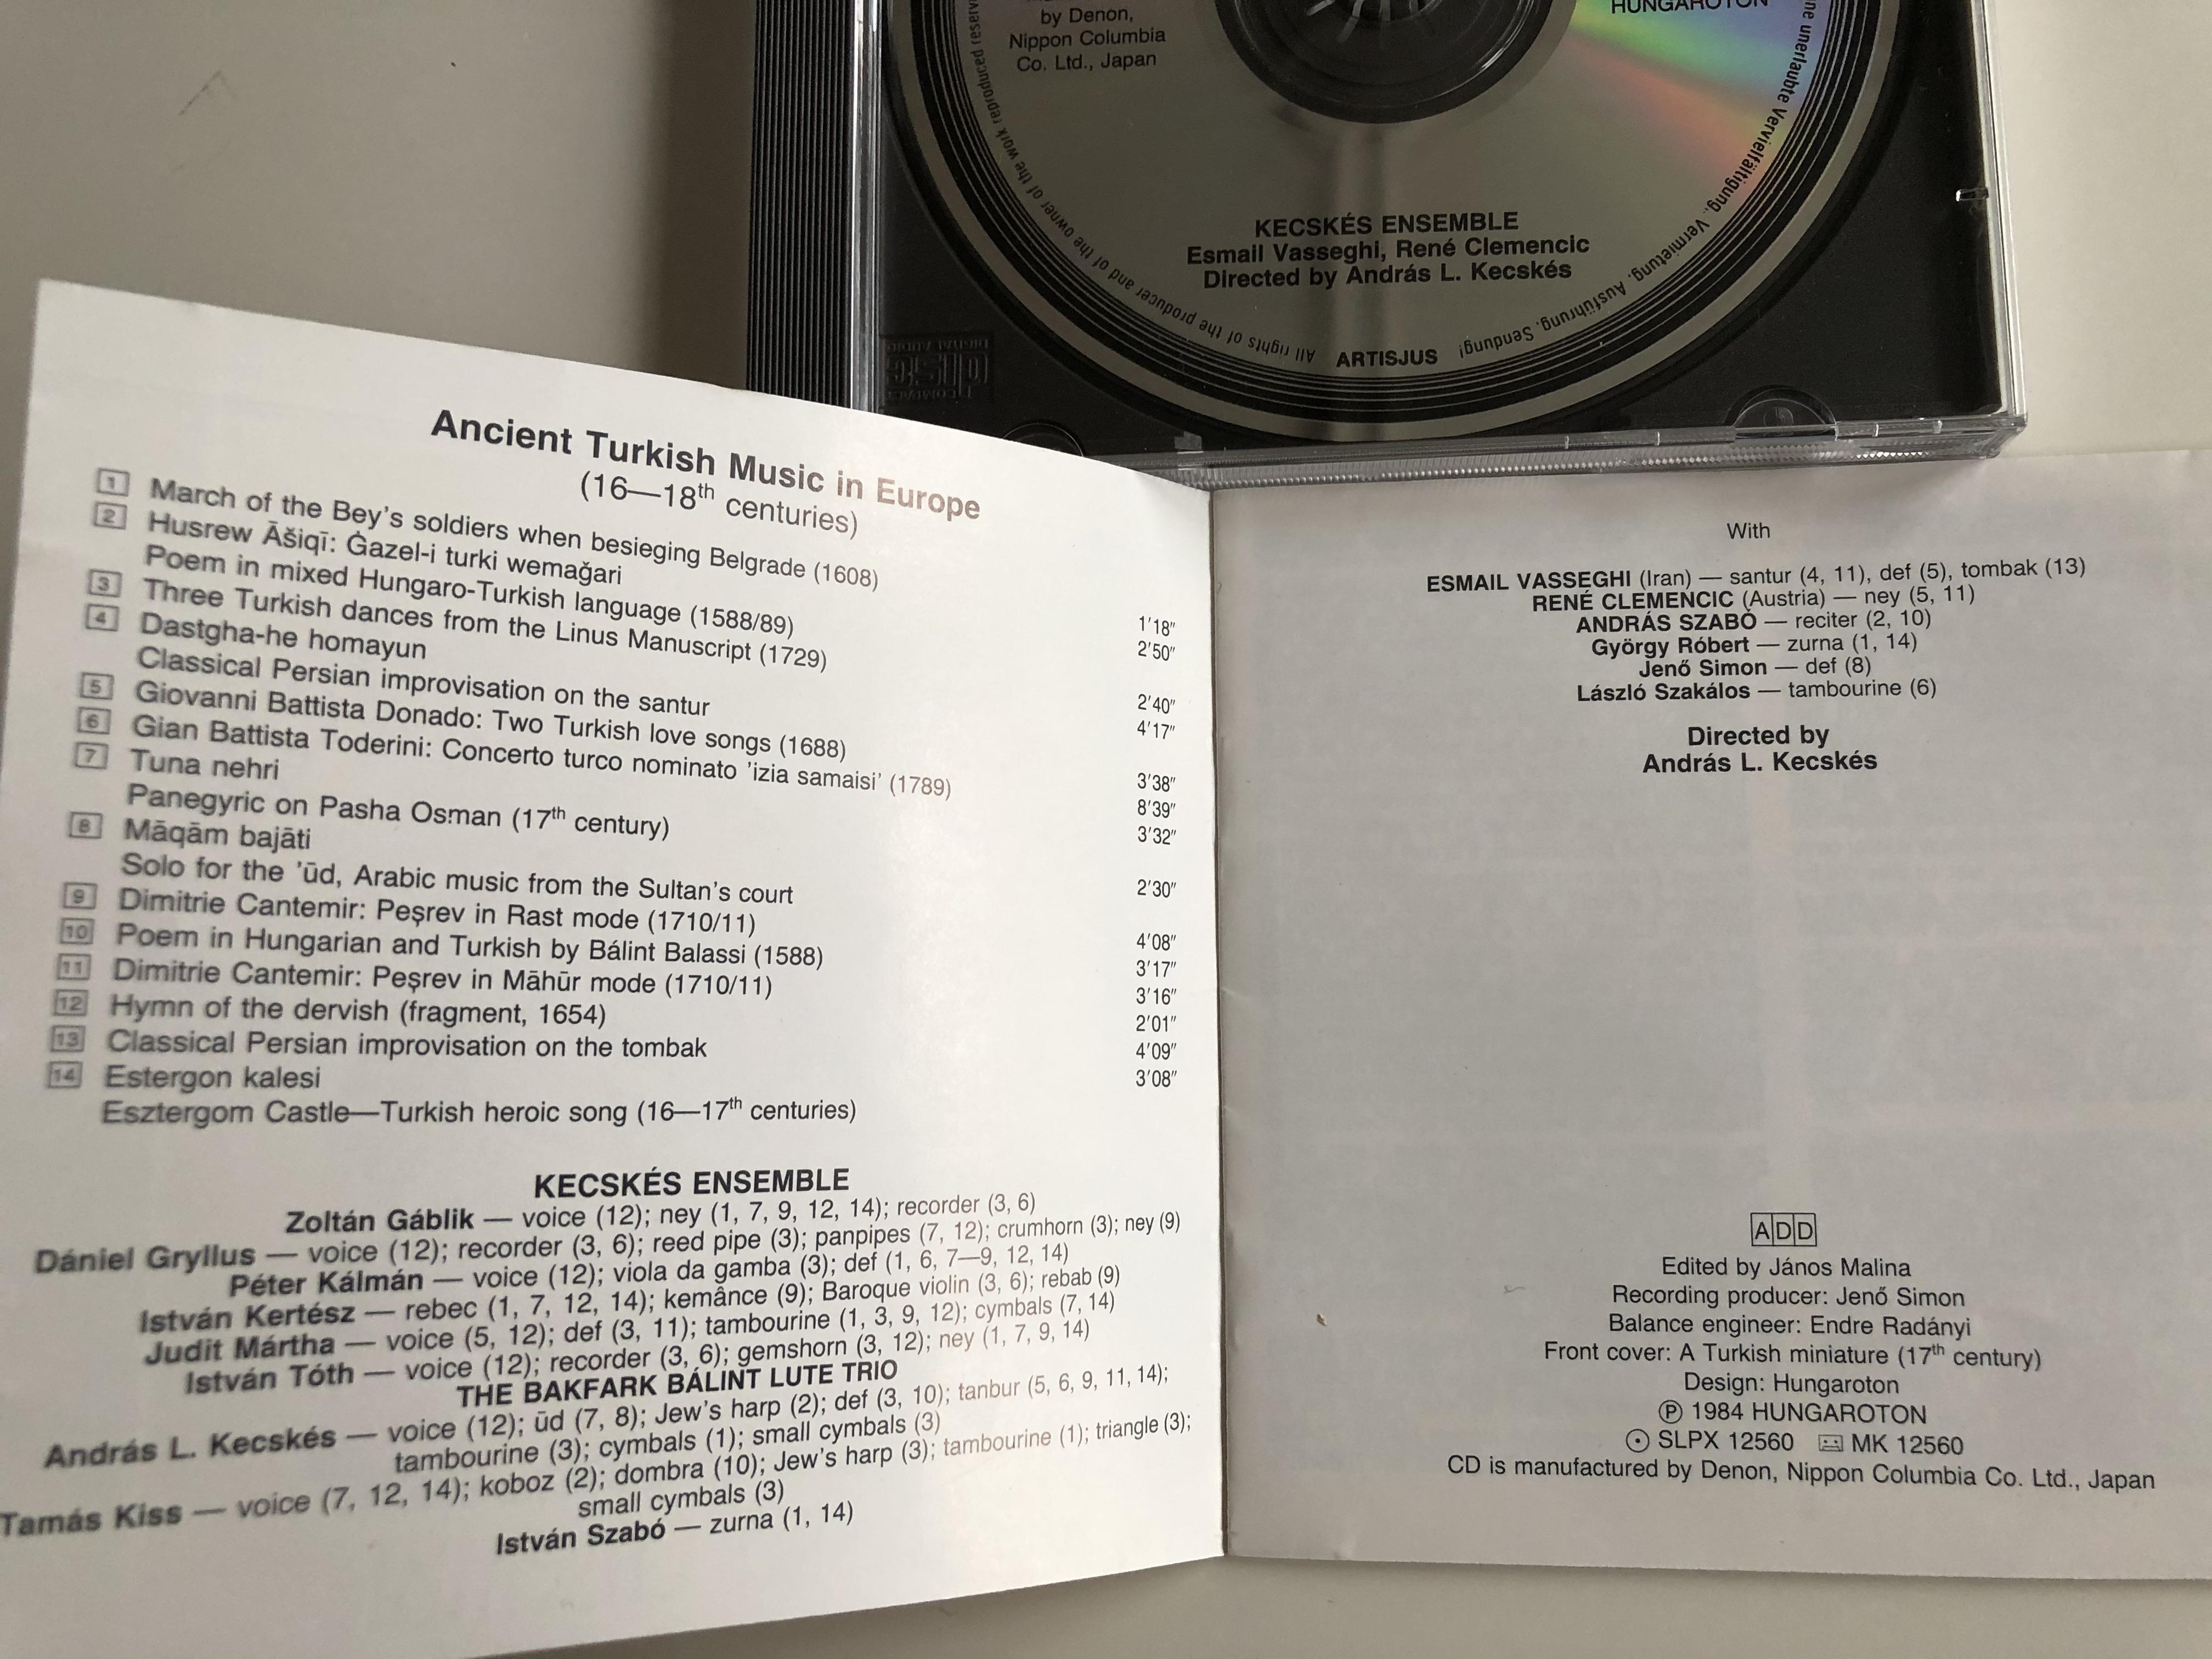 ancient-turkish-music-in-europe-kecsk-s-ensemble-hungaroton-audio-cd-1984-stereo-hcd-12560-2-3-.jpg